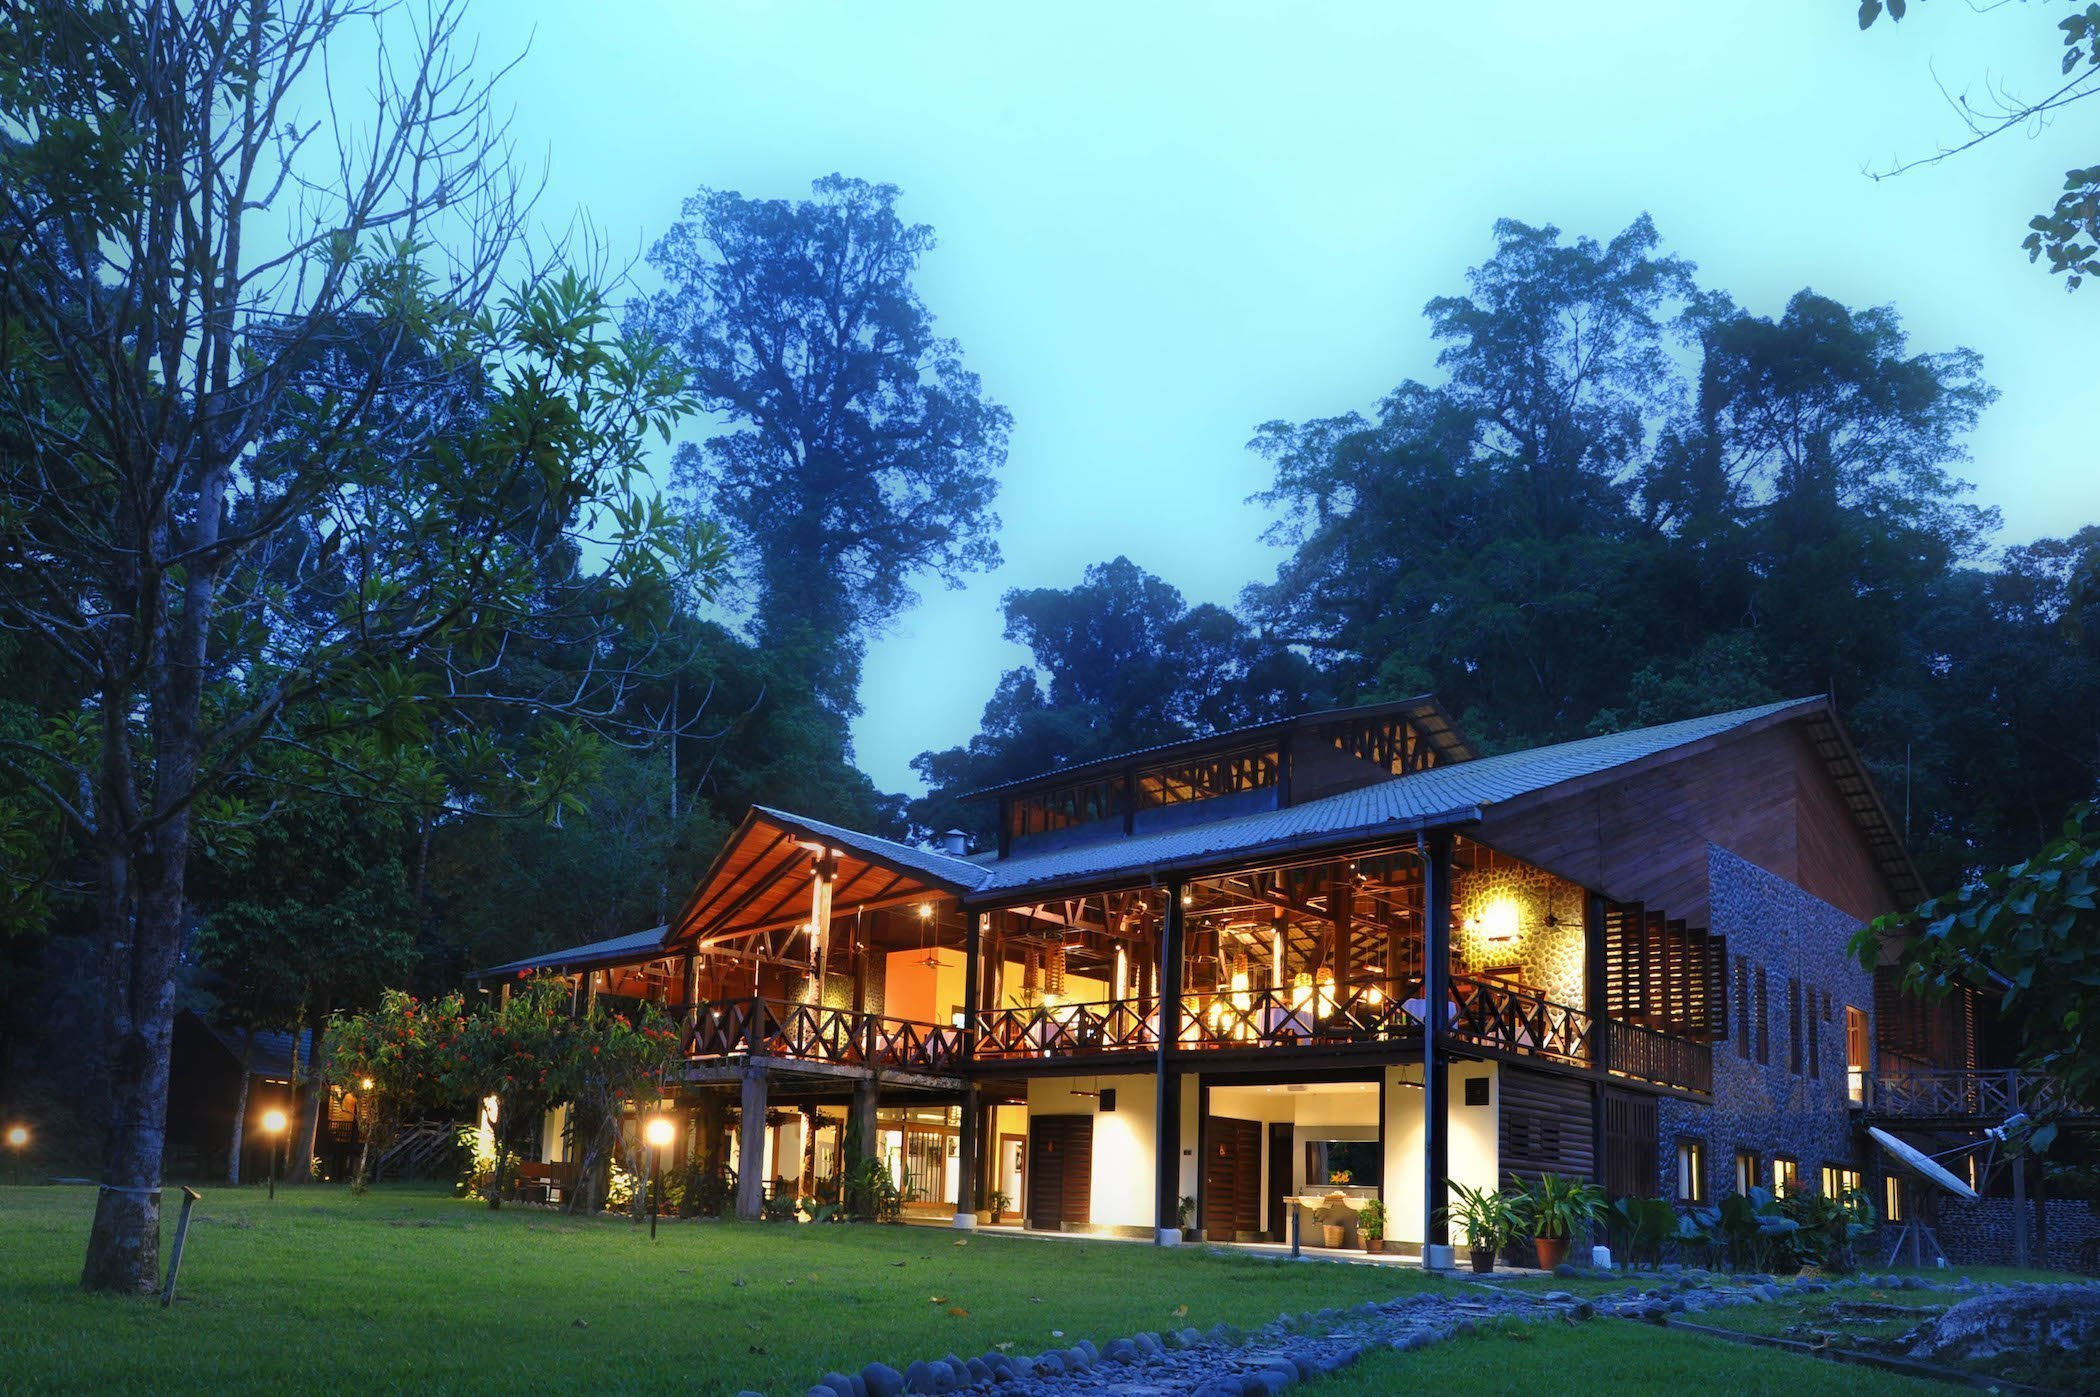 Borneo Rainforest Lodge nestled in Danum Valley's pristine lowland rainforest